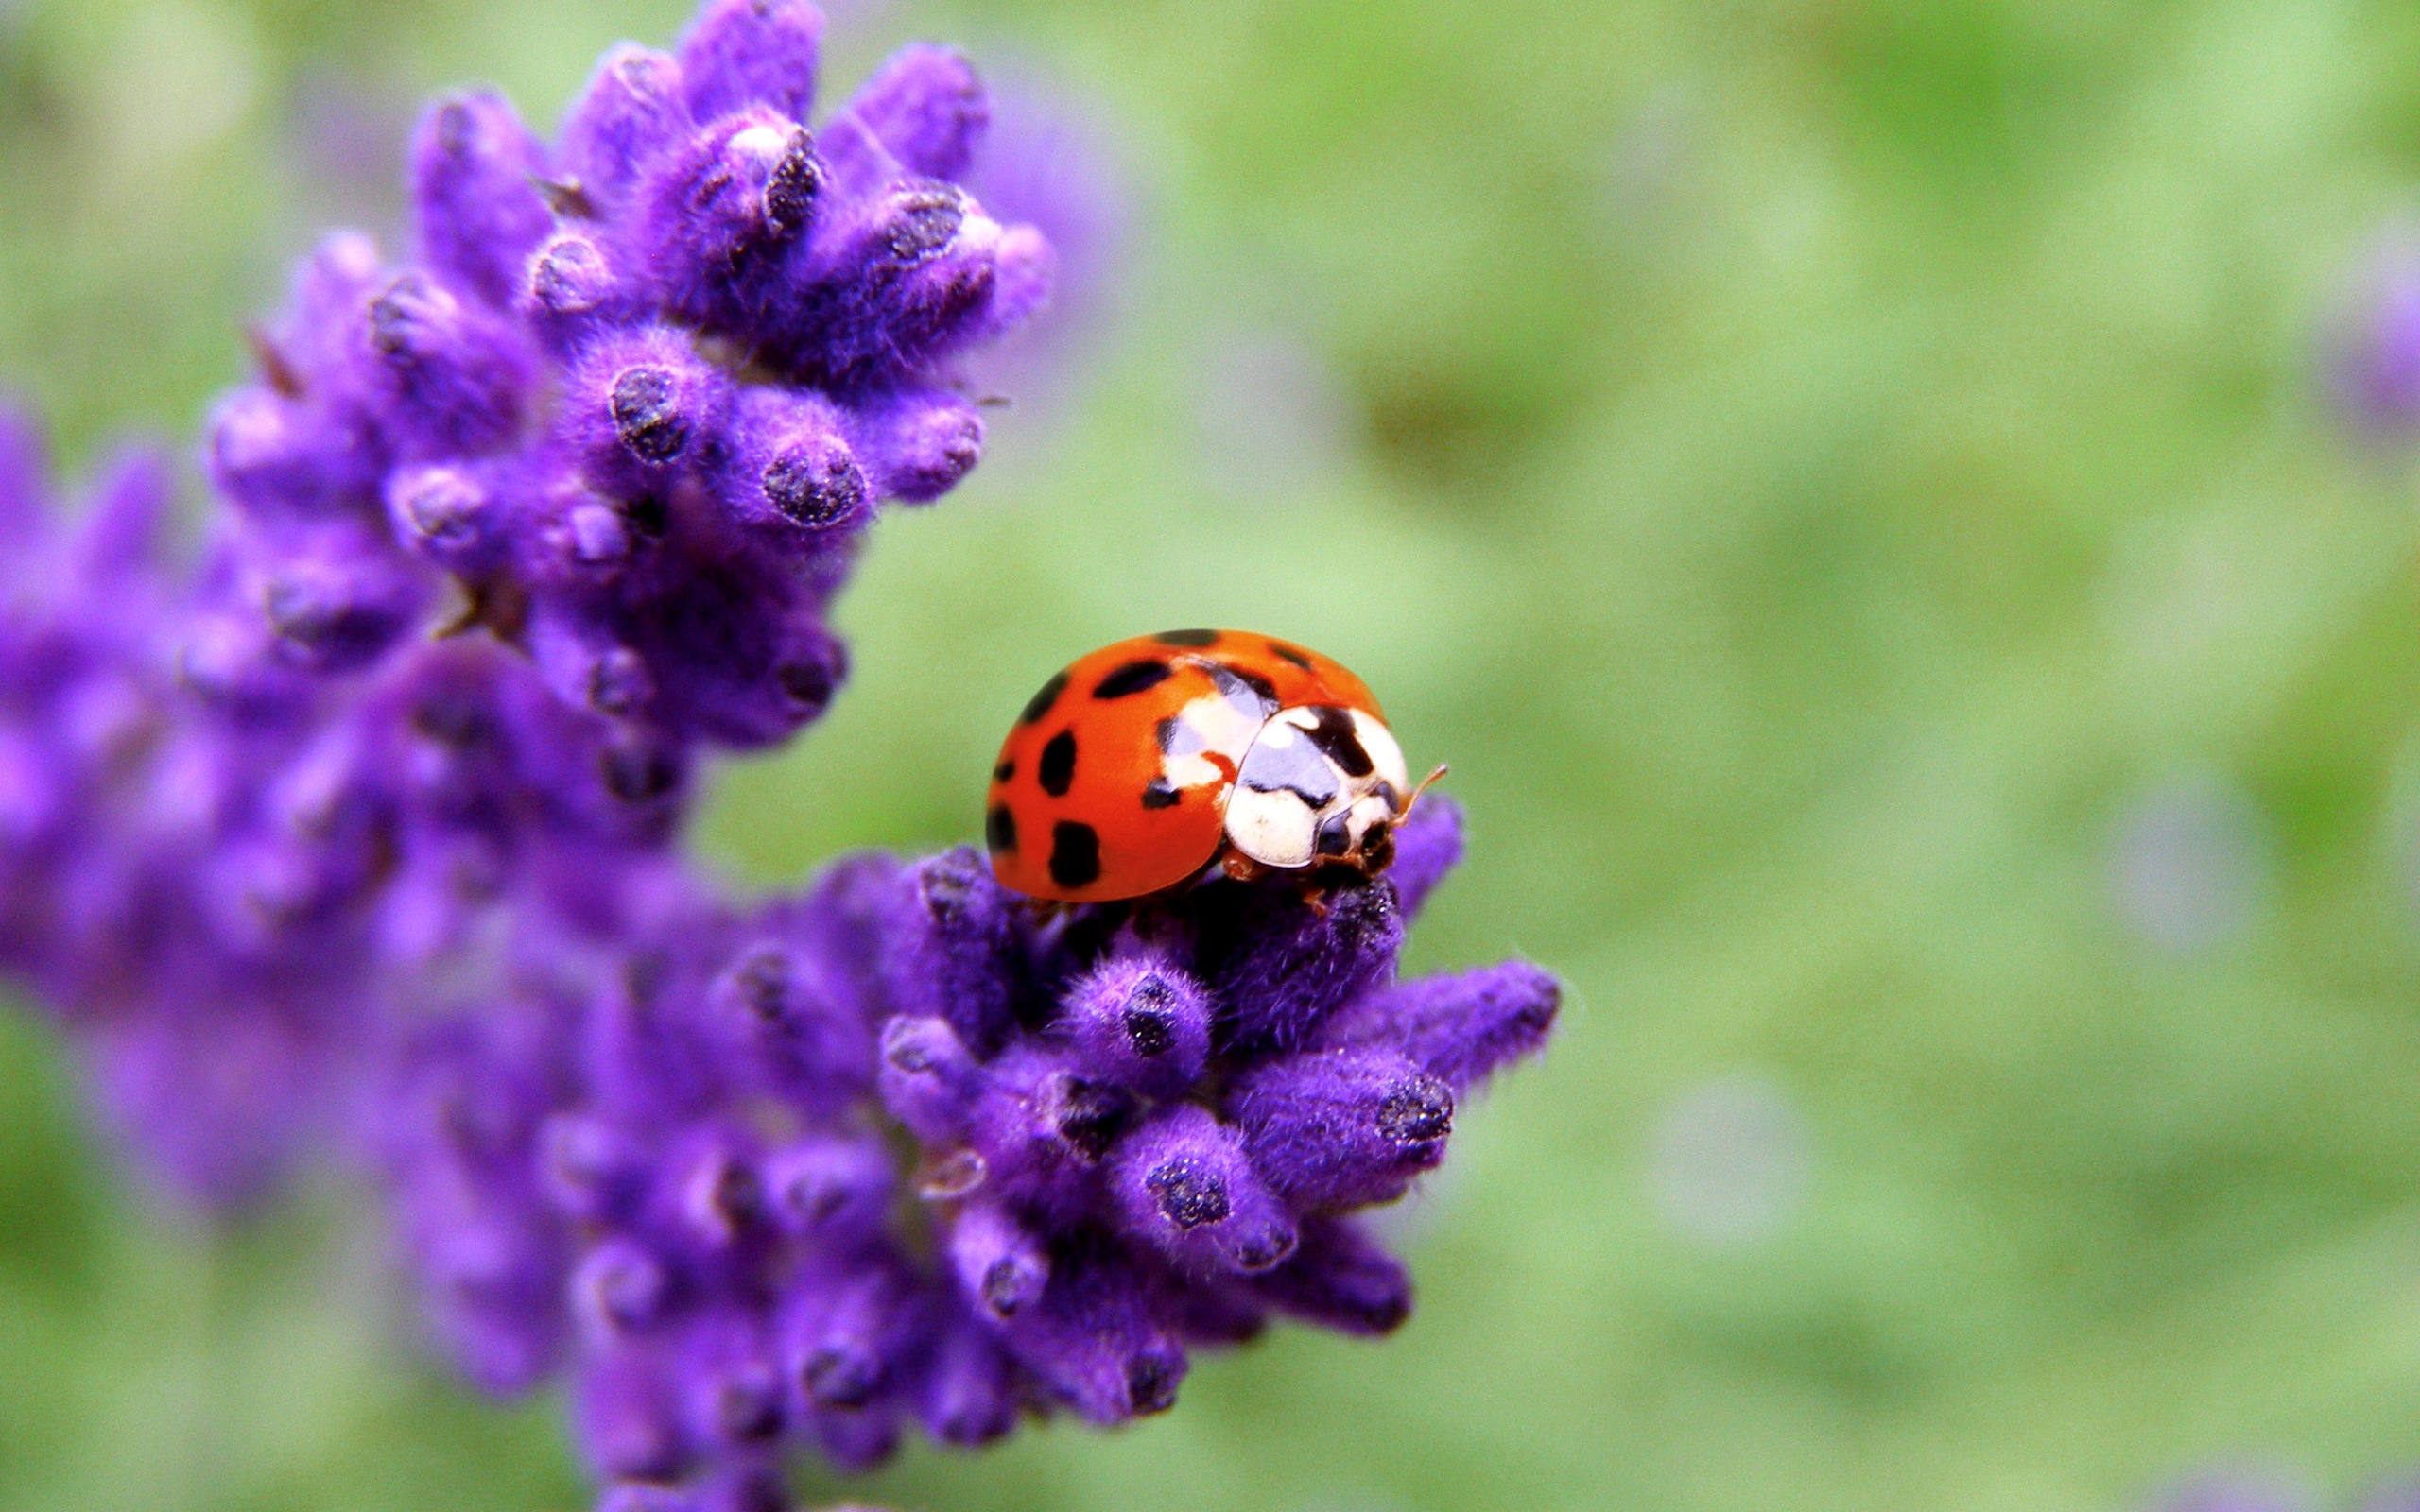 Ladybugs Wallpaper Originals provides original animal   Ladybugs 2560x1600